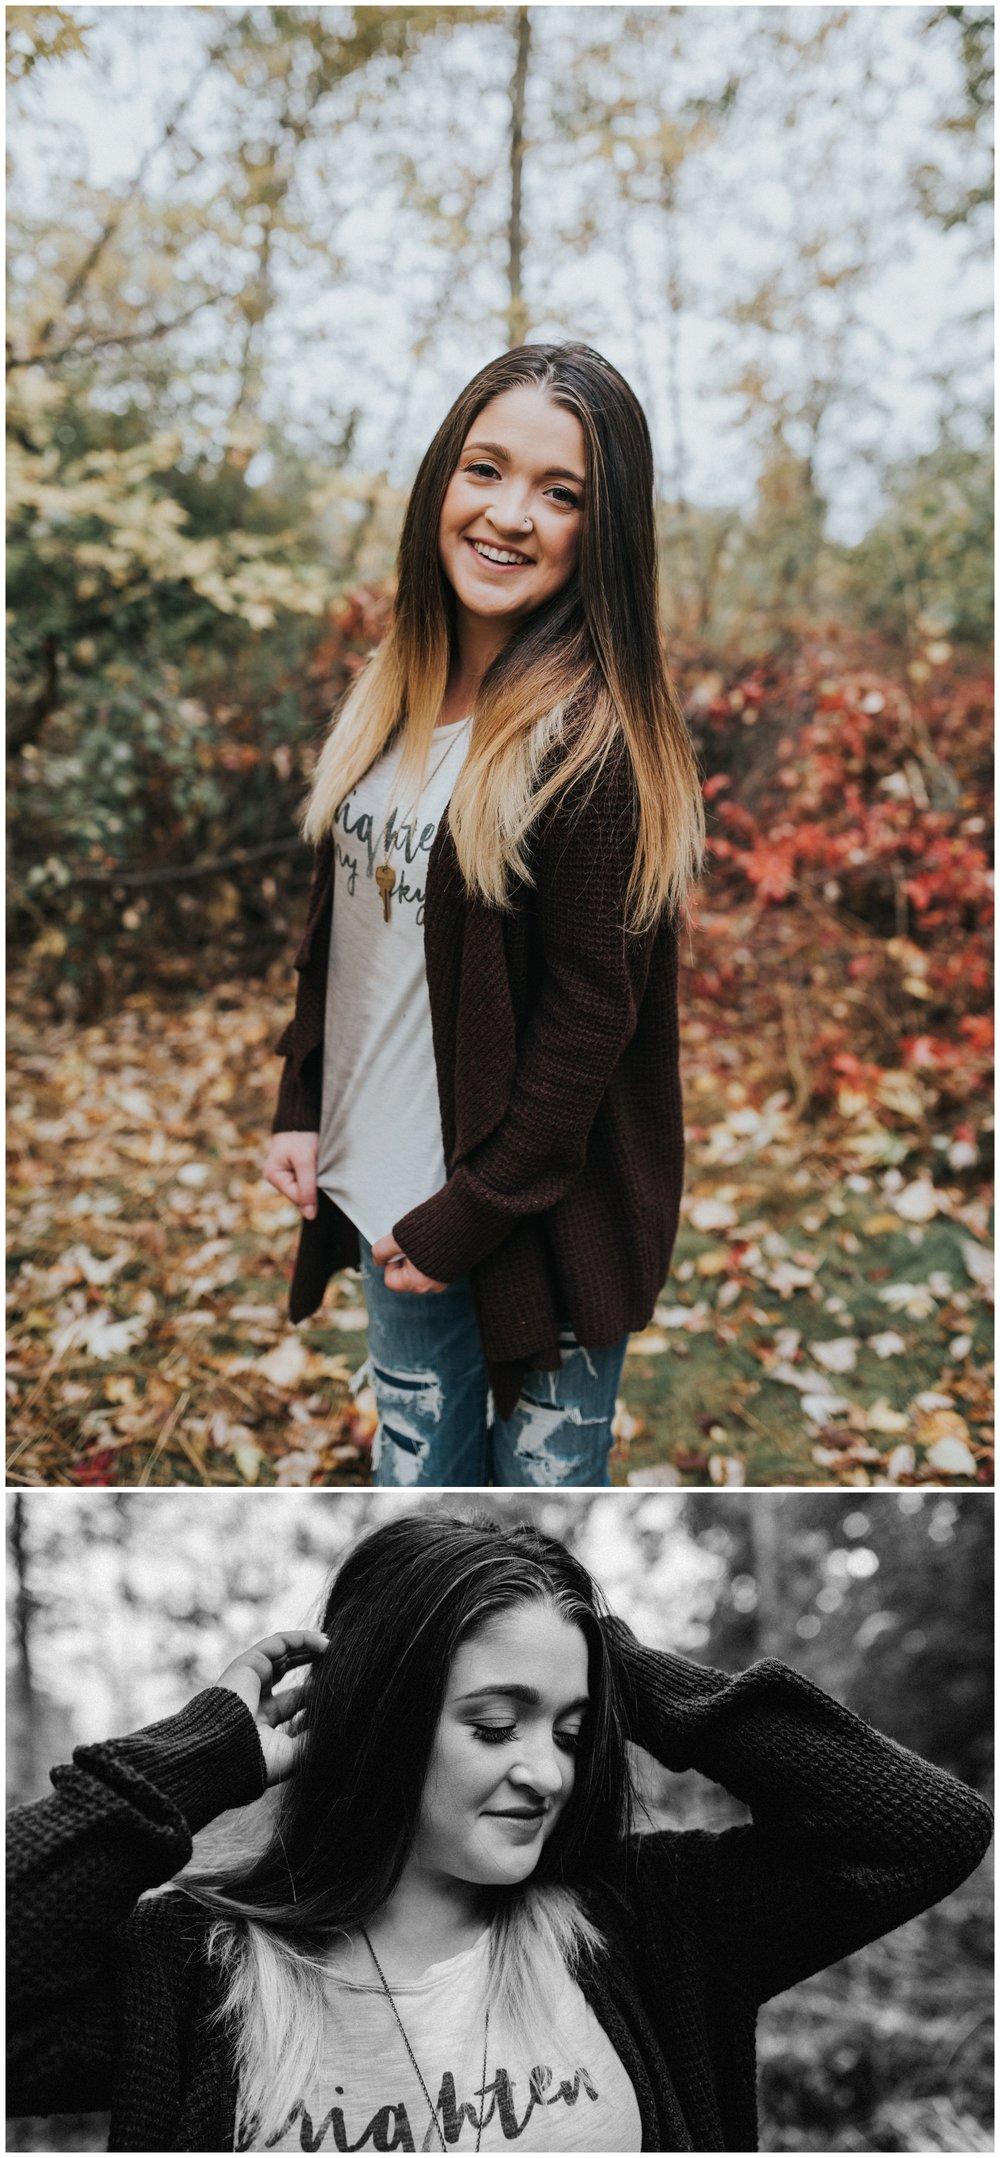 Boise Senior Photographer Makayla Madden Photography Fall Senior Pictures Senior Girl Fall Senior Photos Outfit Ideas Inspiration Fall Vibes Fall Portraits Idaho Hair Flips Fun Senior Pics Eagle Idaho